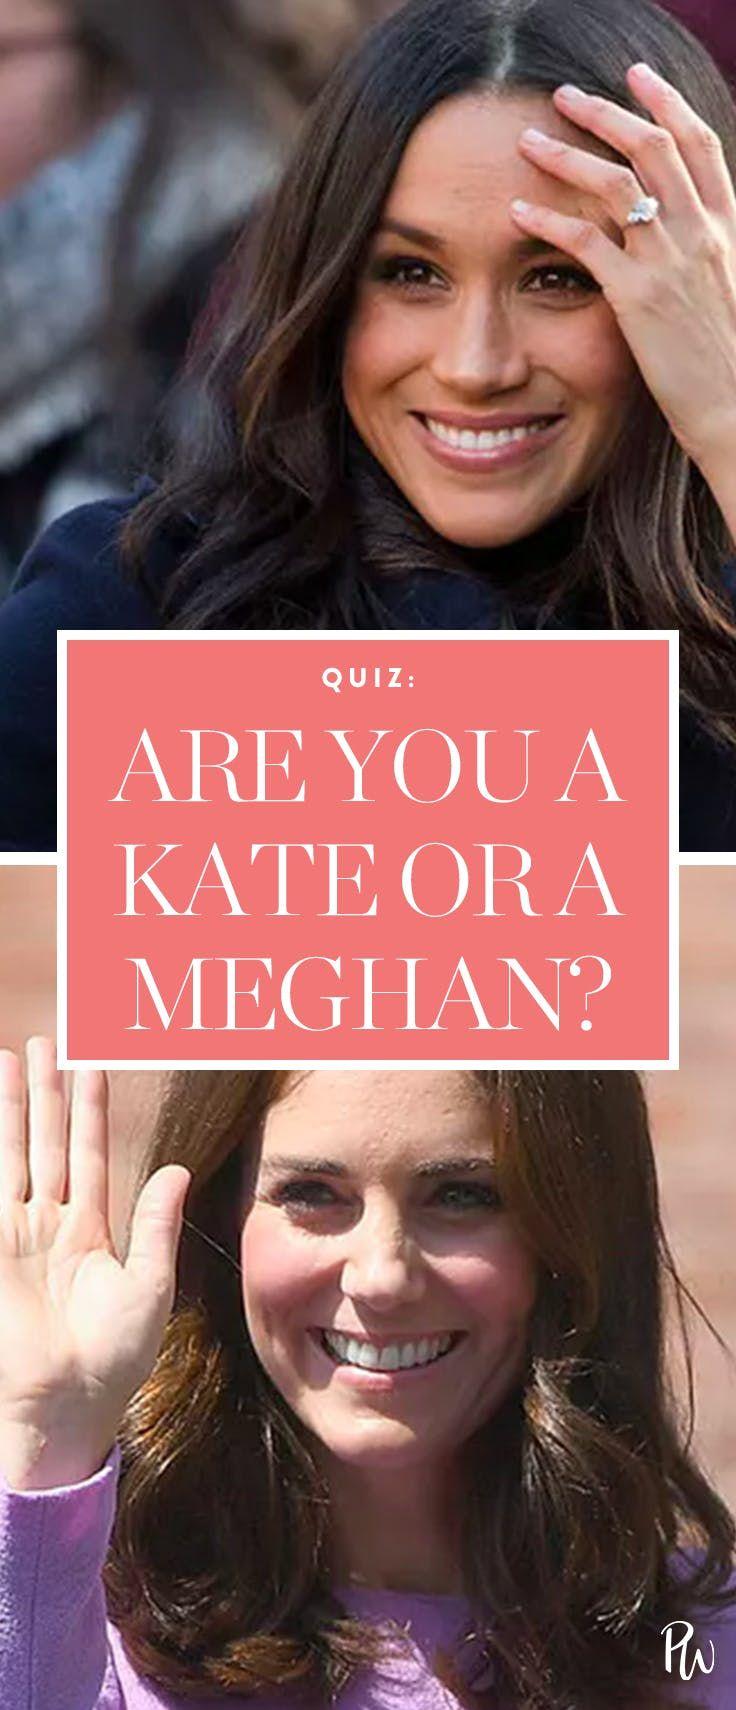 162 mejores imágenes de Realeza en Pinterest | Princesas, Inglaterra ...